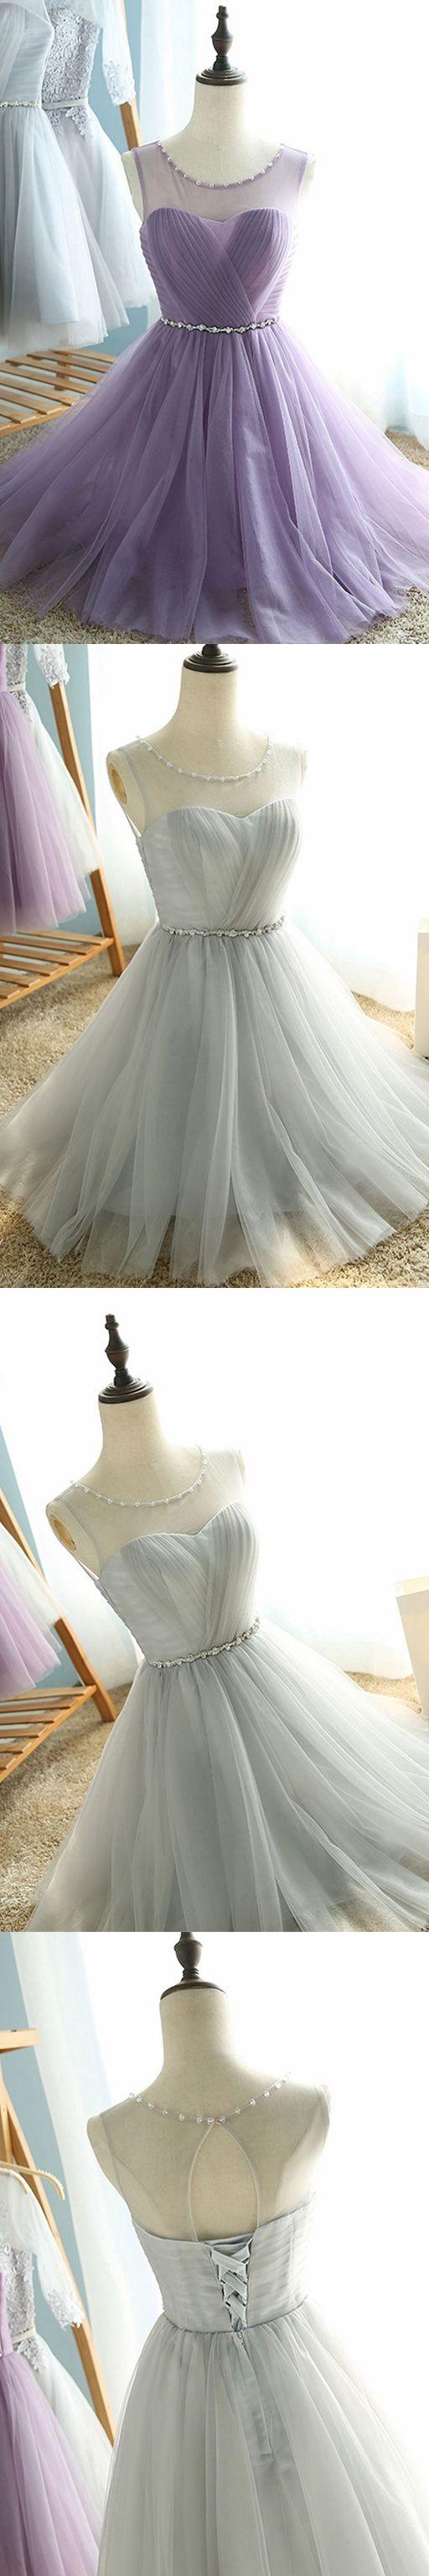 Homecoming Dresses, Short Prom Dresses, Formal Dresses, Graduation Party Dresses, Banquet Gown